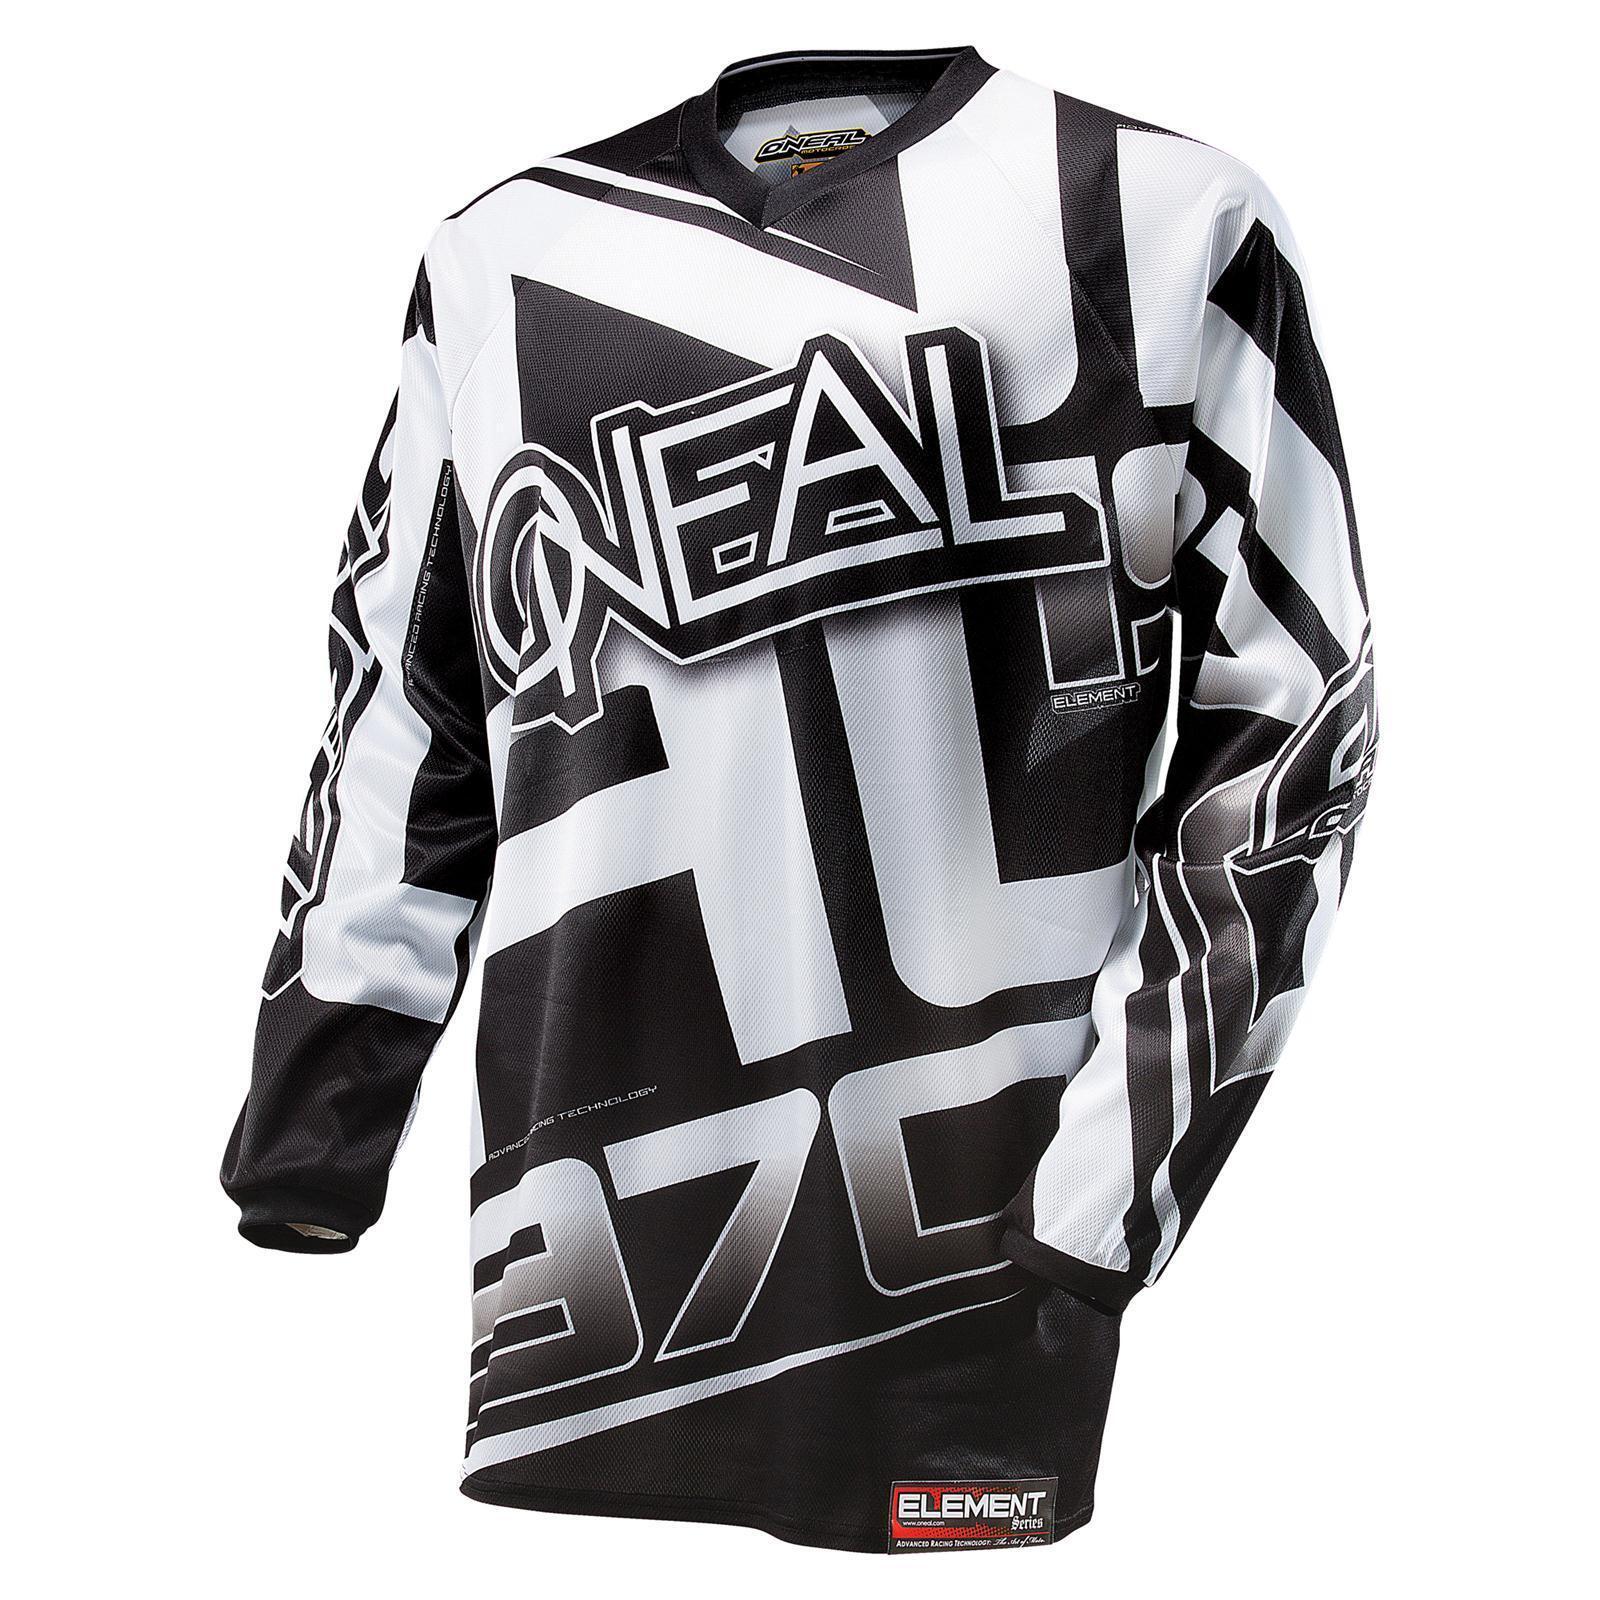 ONeal Moto Cross Jersey RACEWEAR black MX Motorrad Enduro MTB Fahrrad Shirt DH